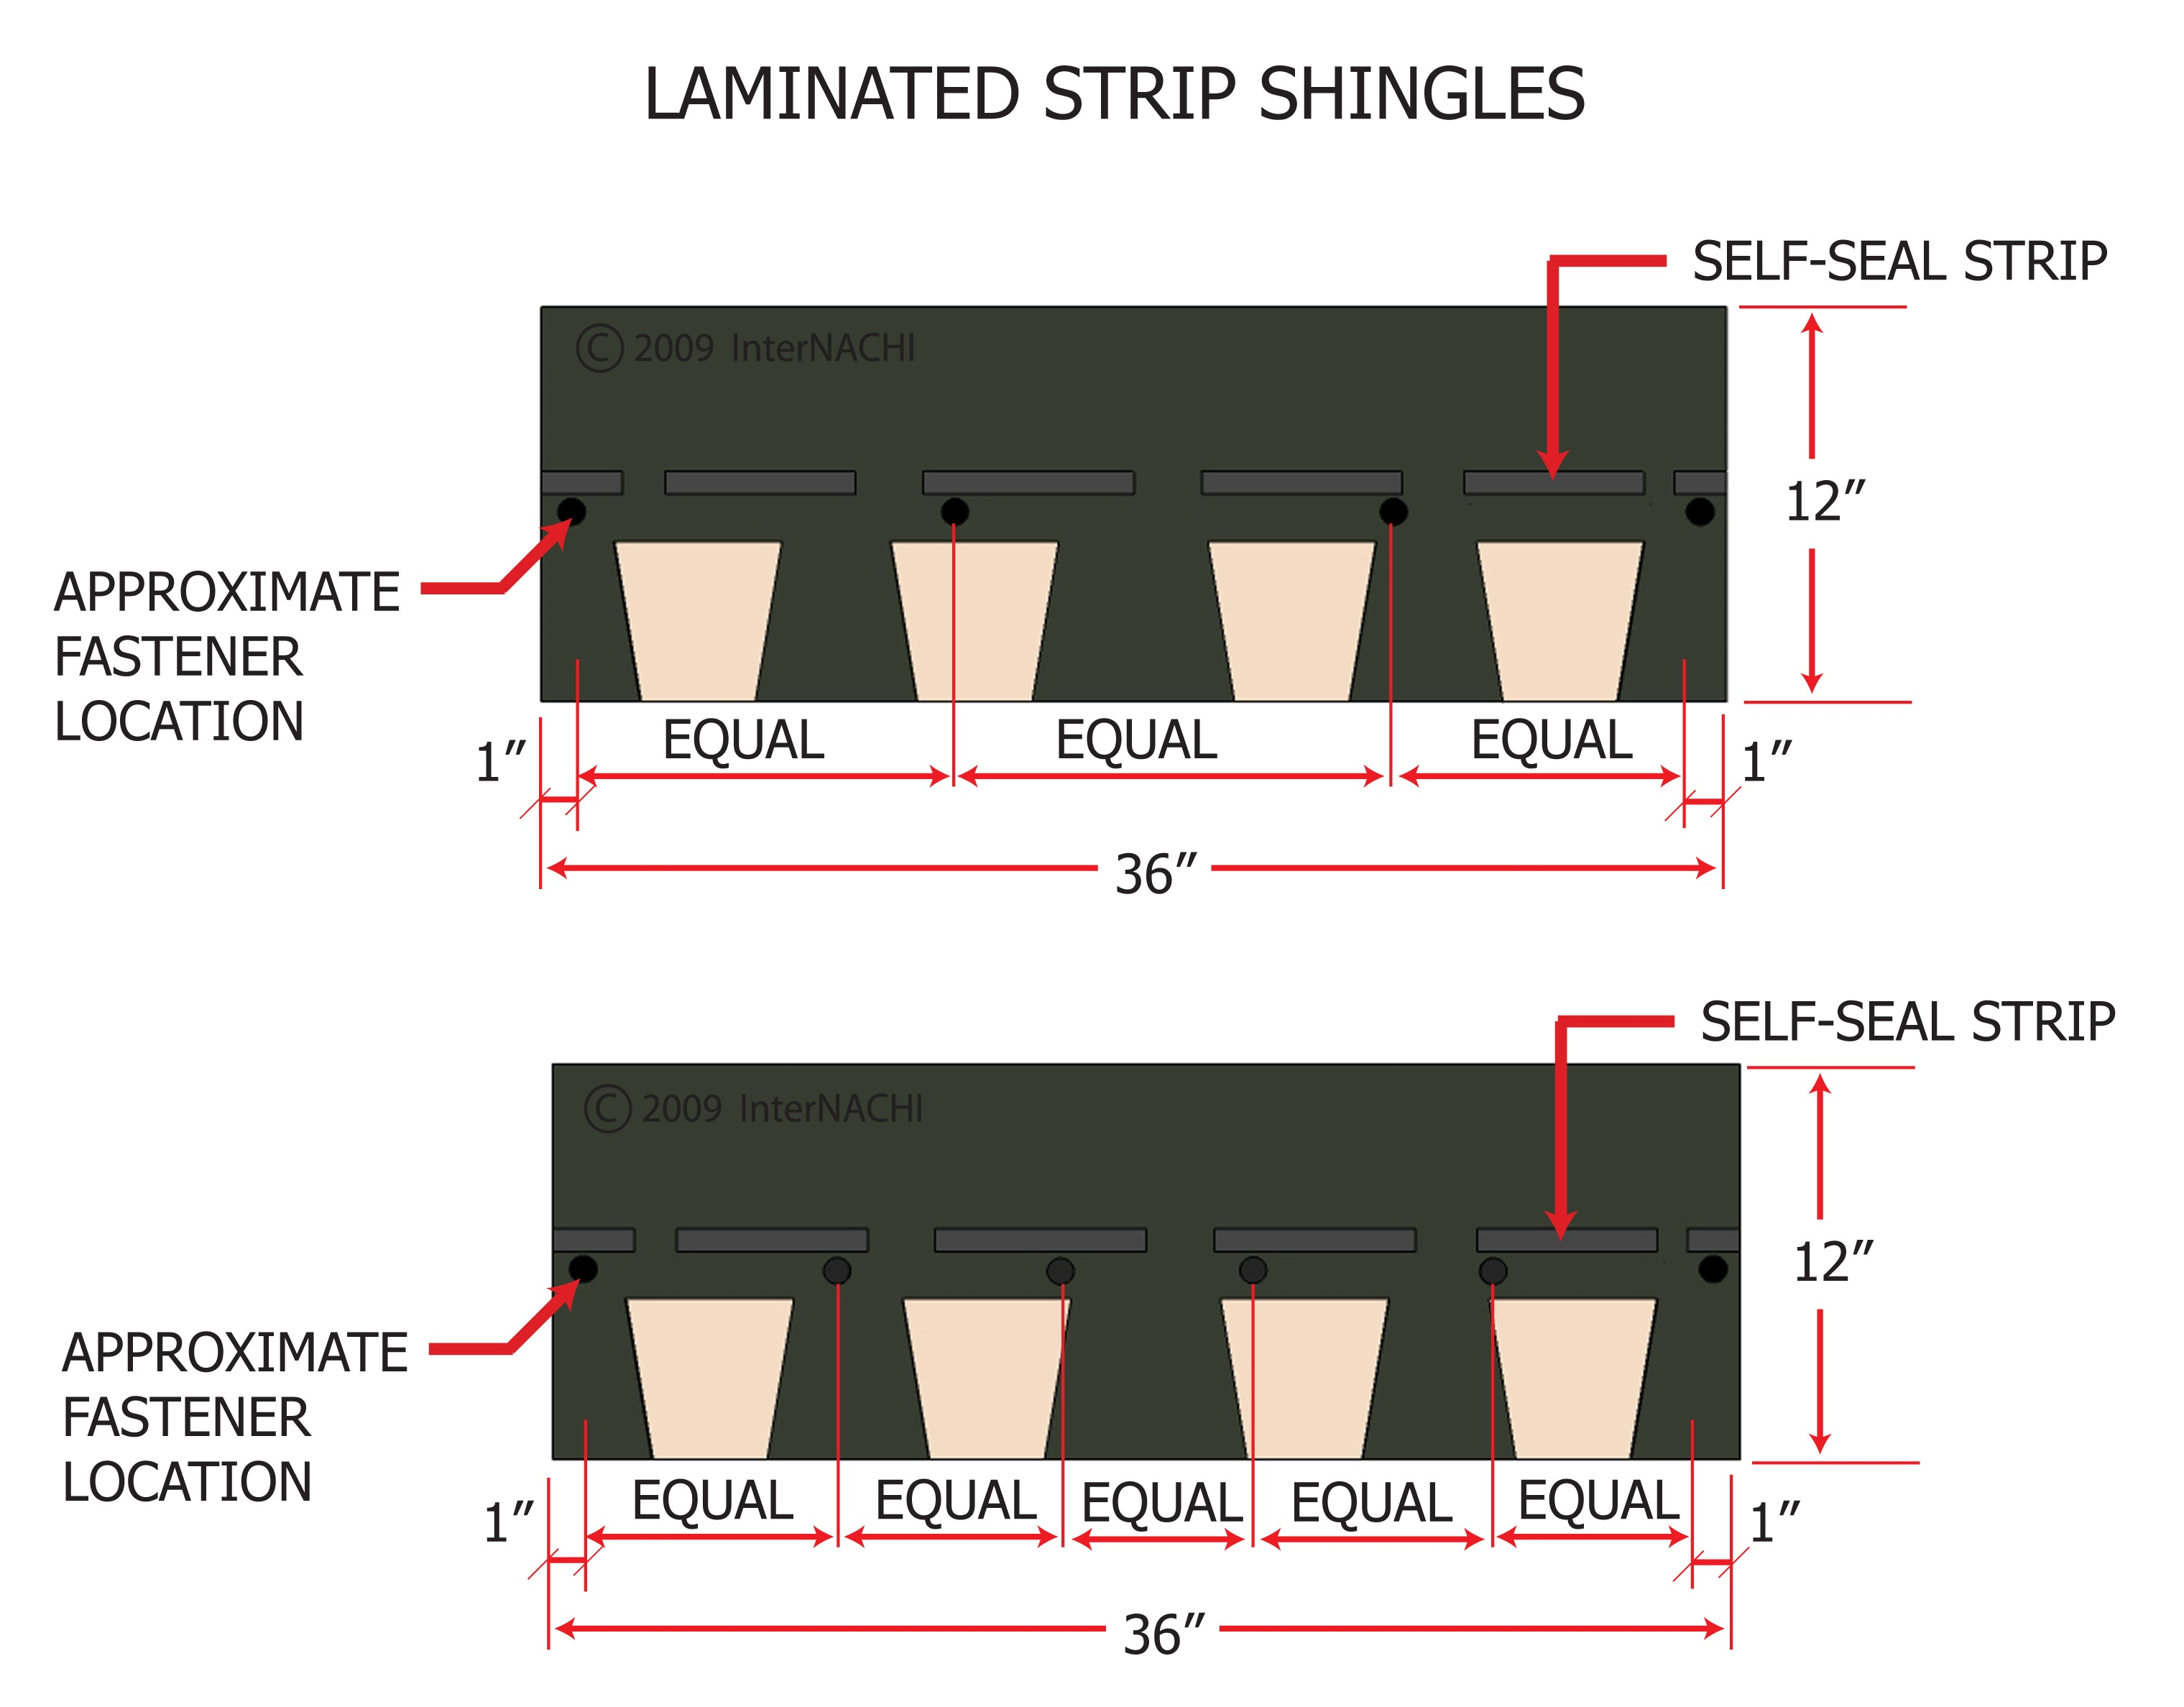 Laminated strip shingles.